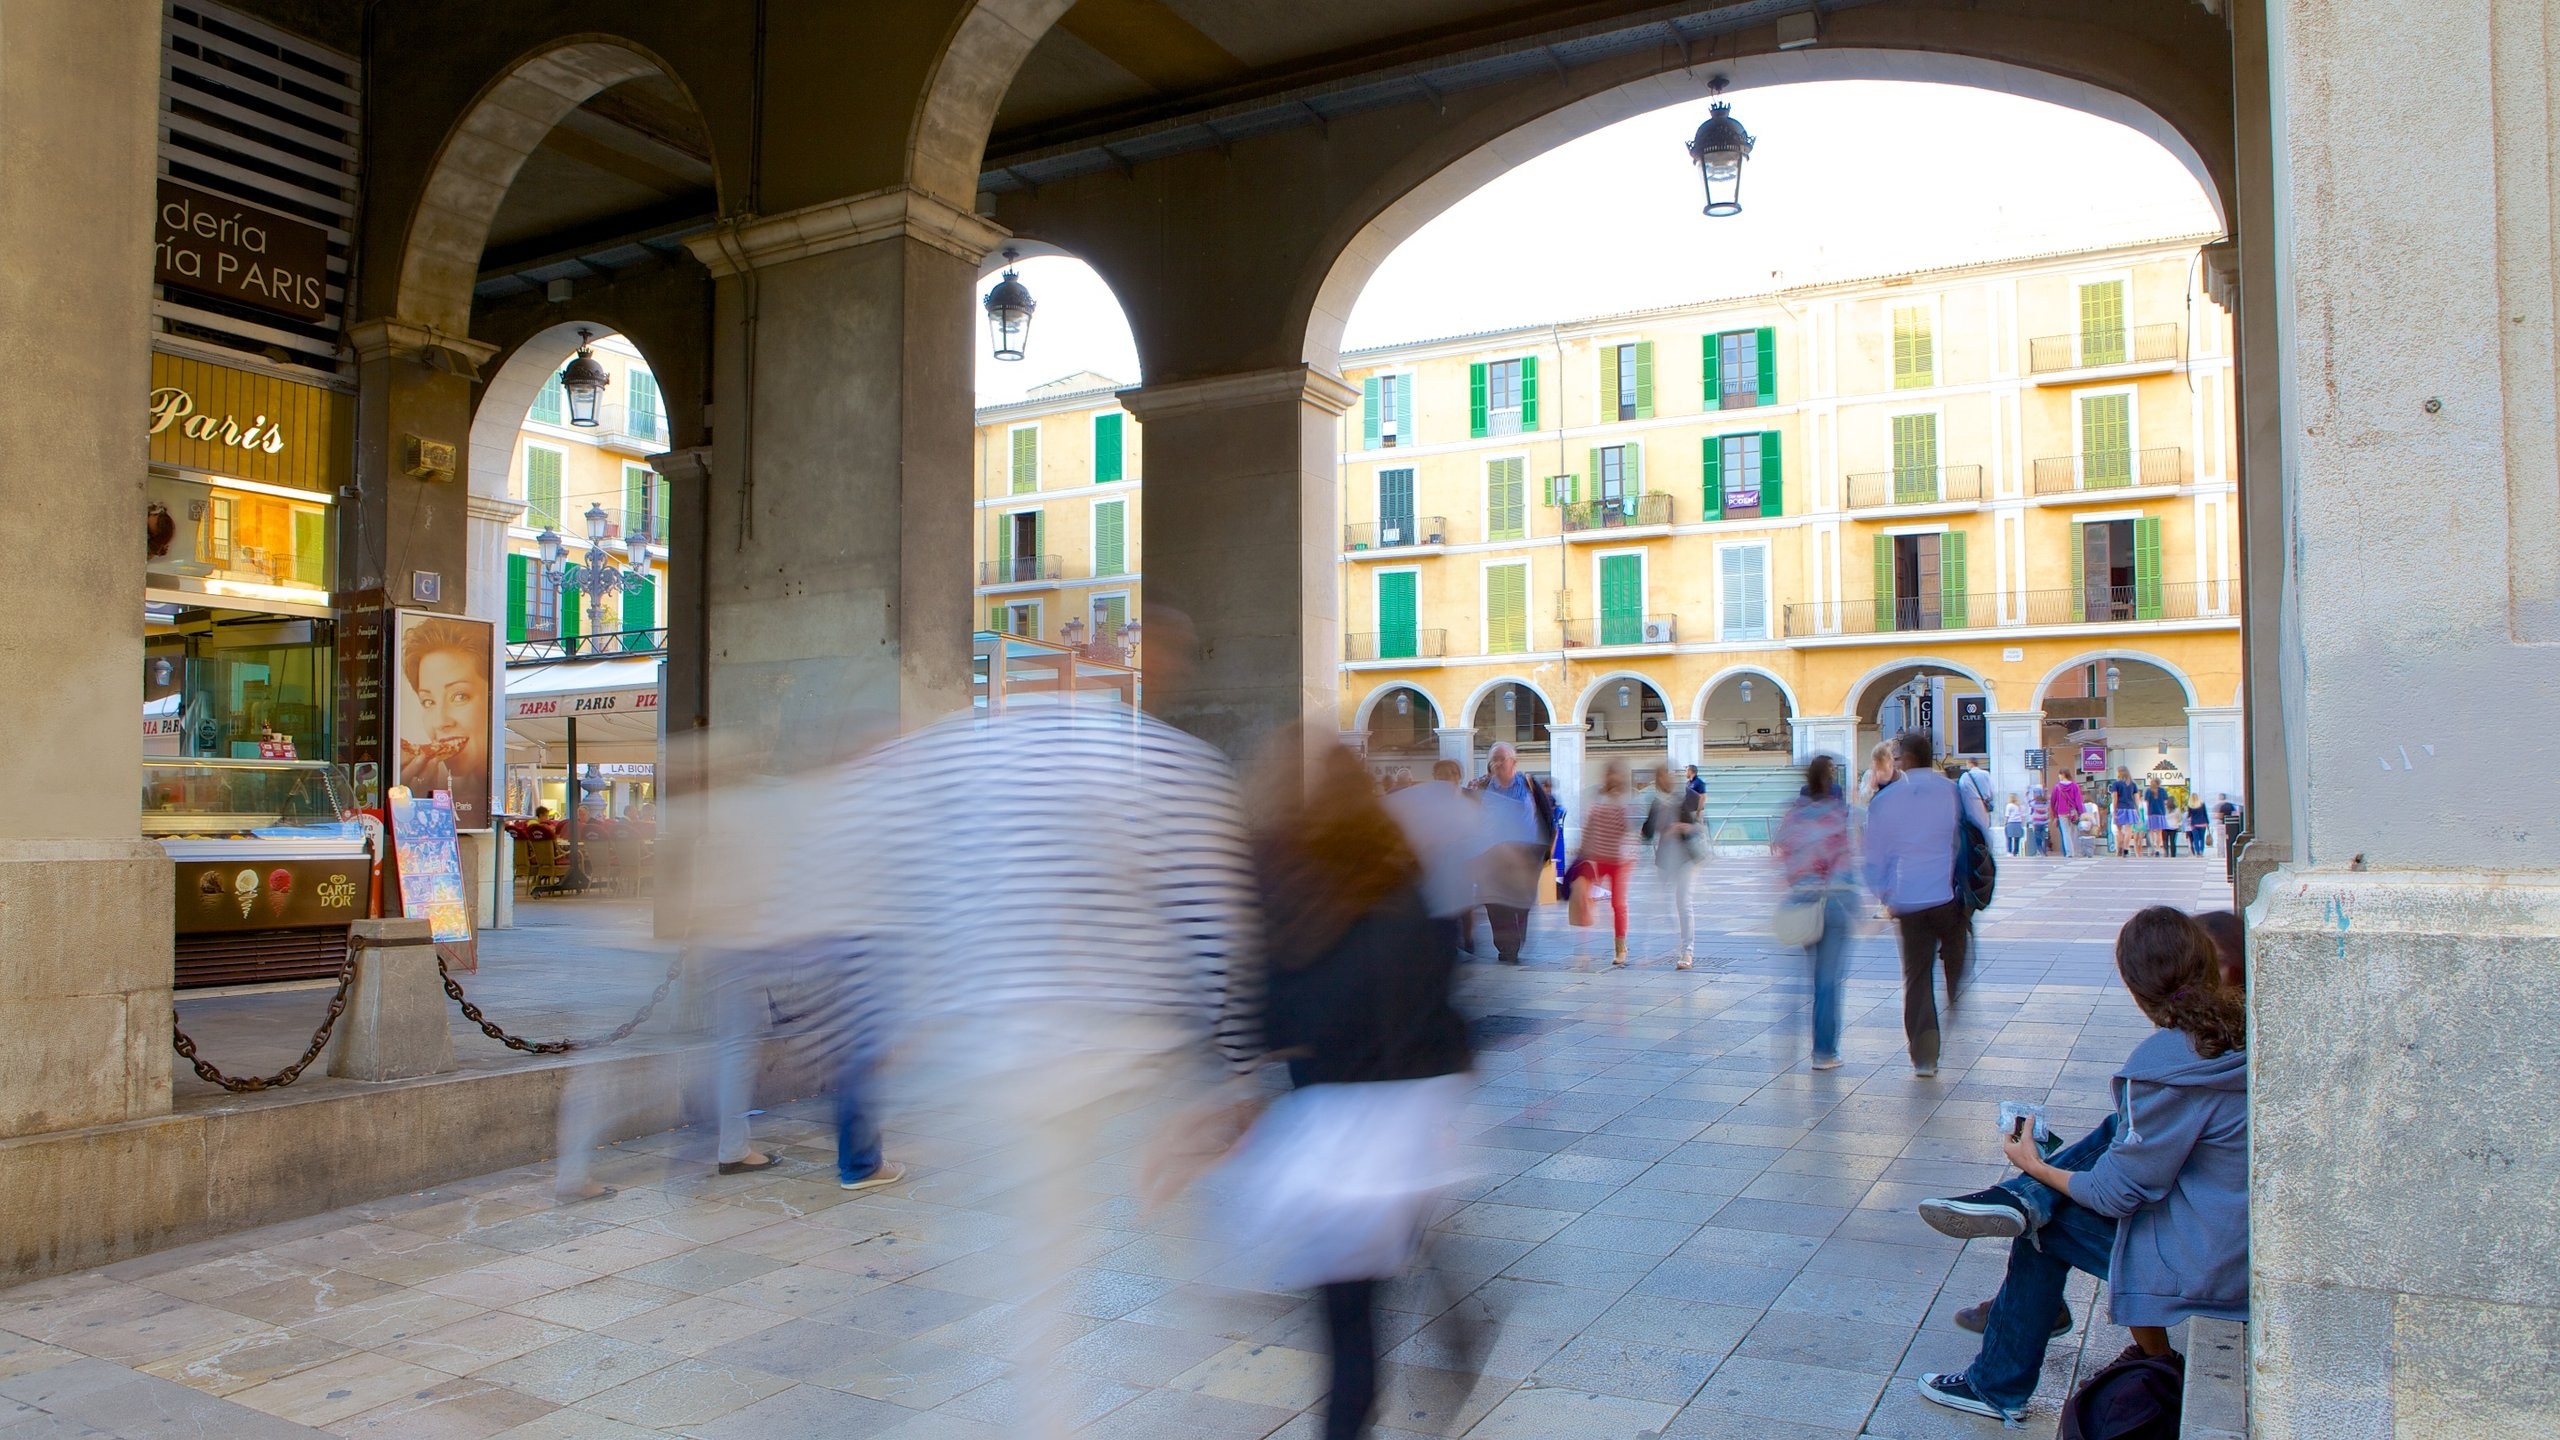 Plaza Mayor de Palma, Palma de Mallorca, Balearic Islands, Spain